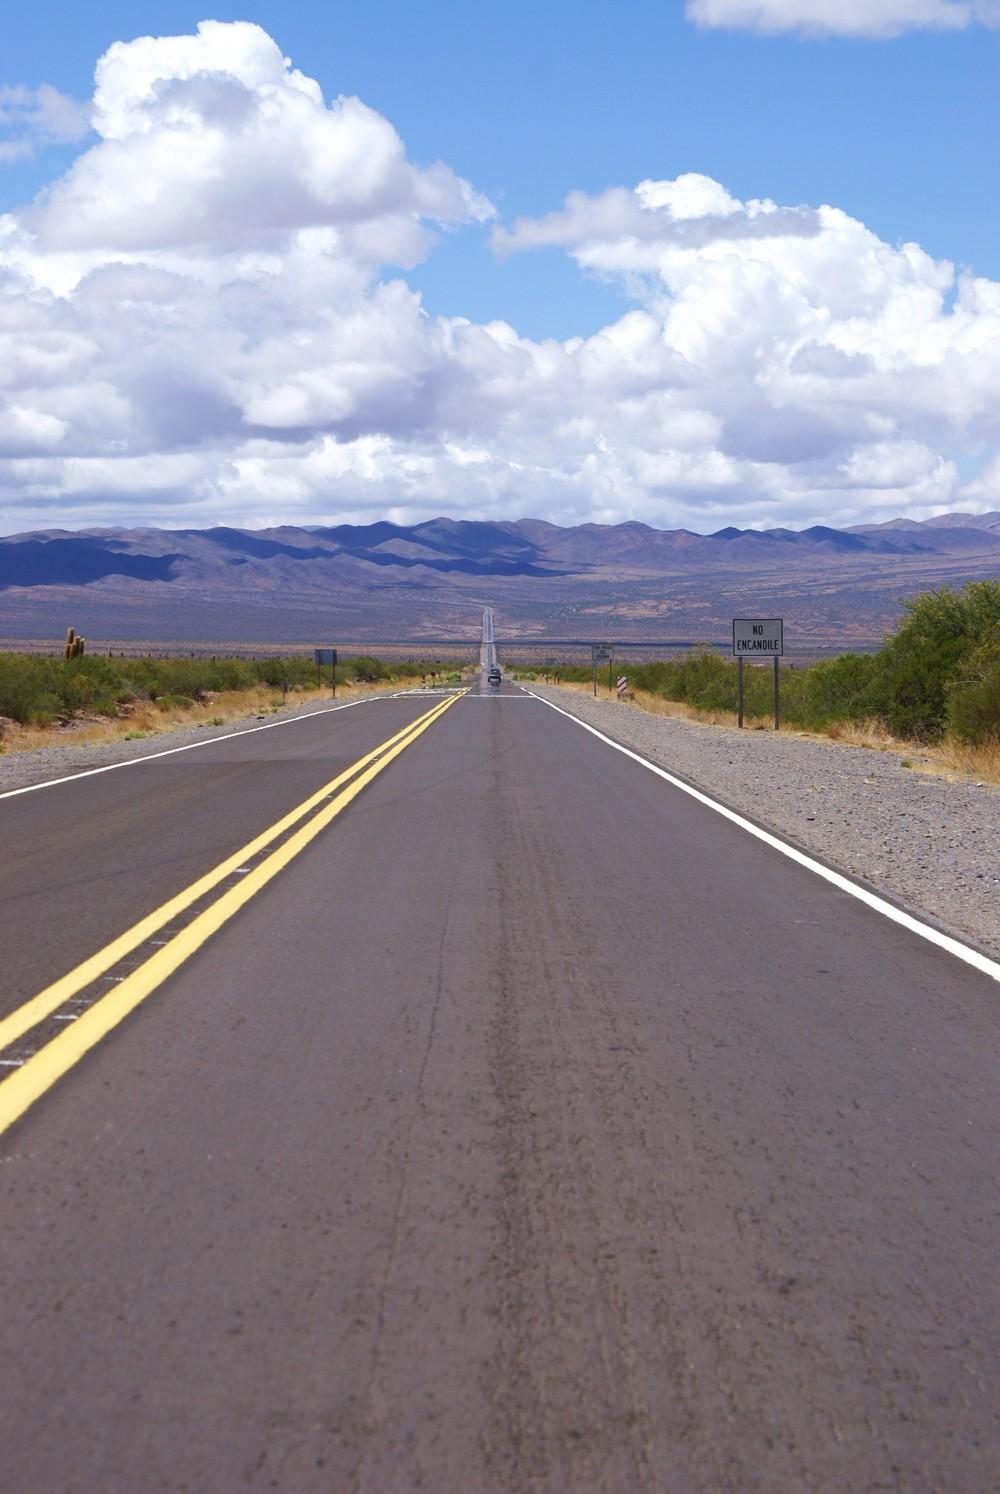 Parque Nacional Los Cardones - Recta Tin Tin